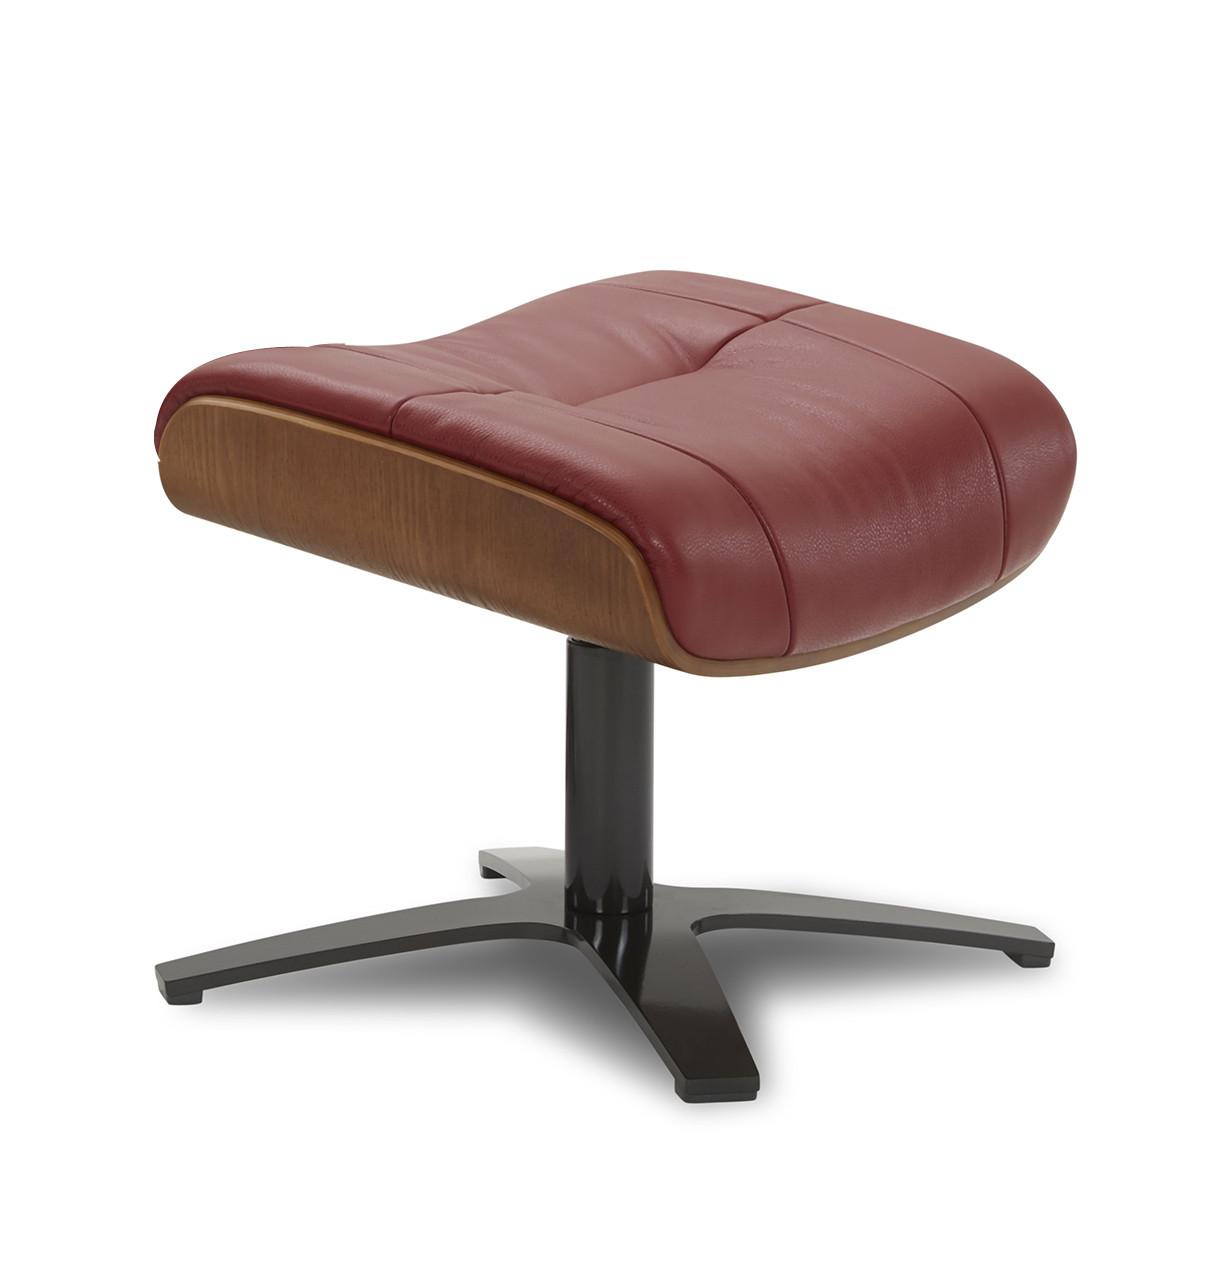 Repose-pieds de relaxation cuir rouge et chêne naturel